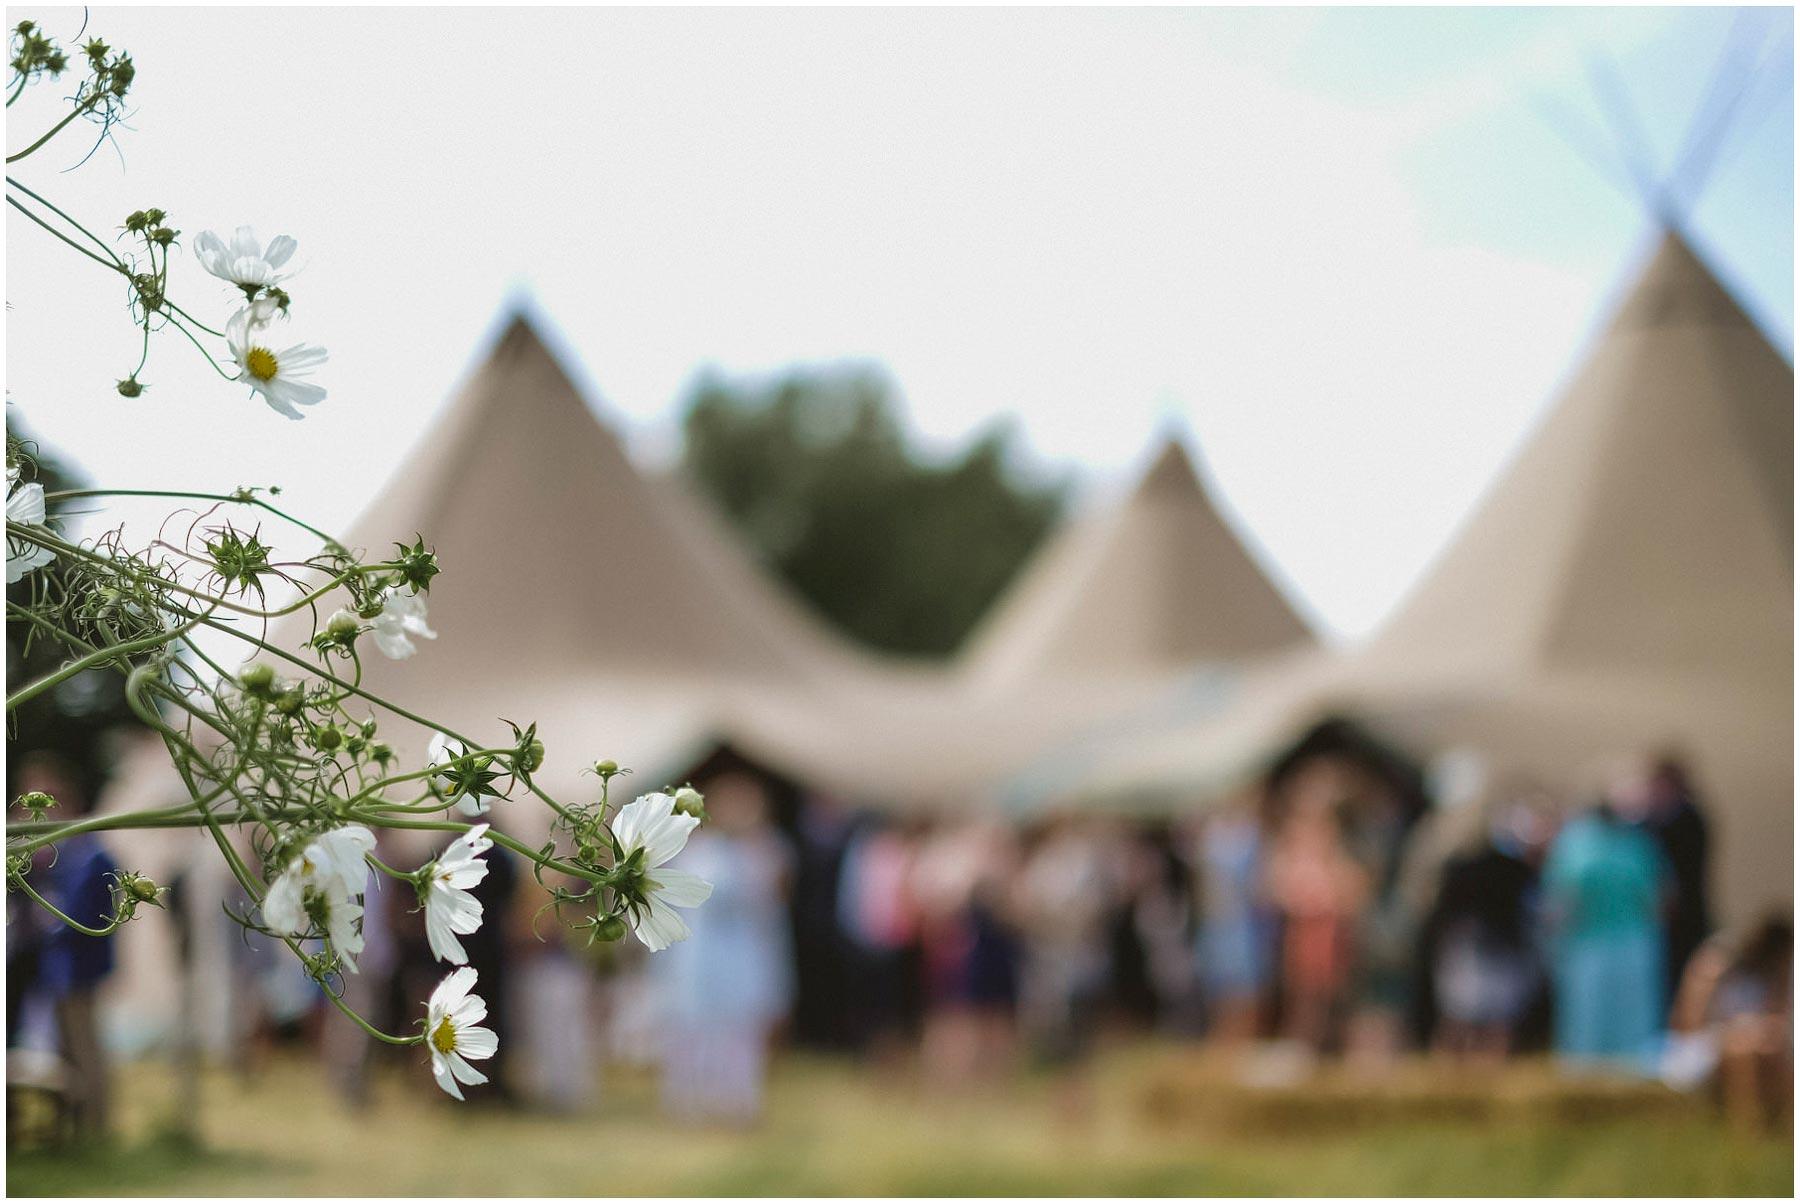 Kent-Festival-Tipi-wedding-photography_0096